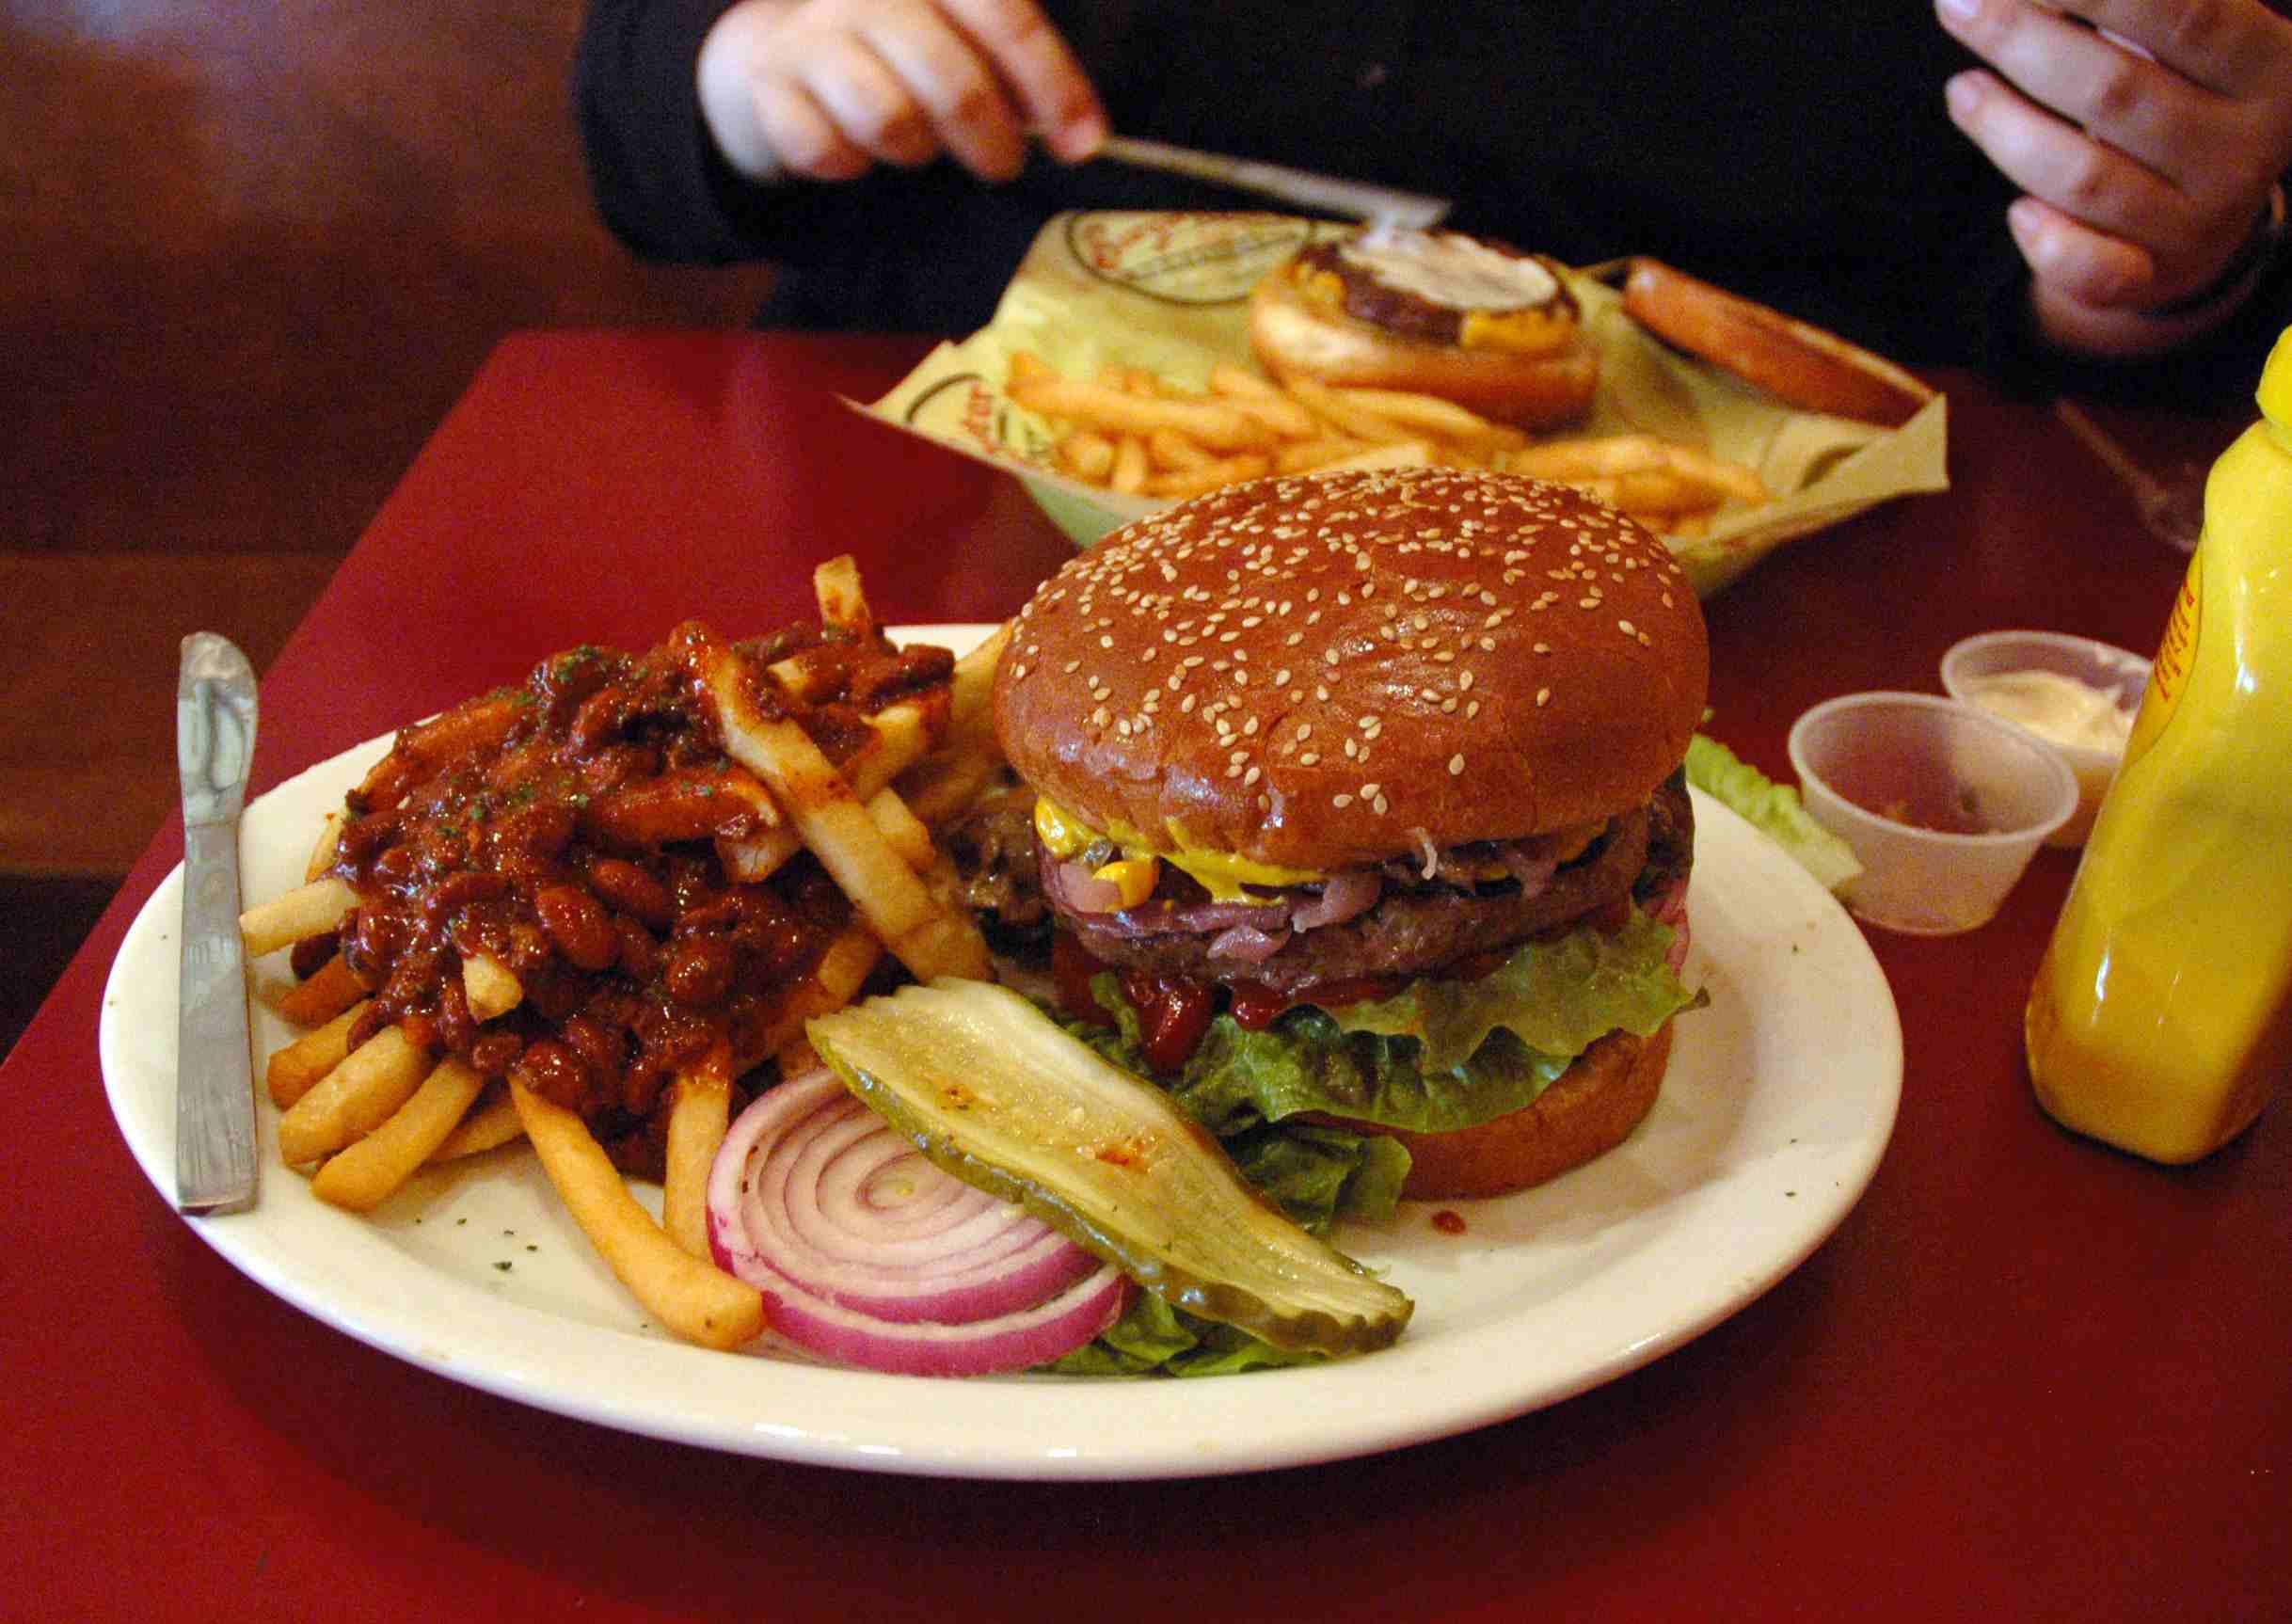 Burgermeister burger & fries